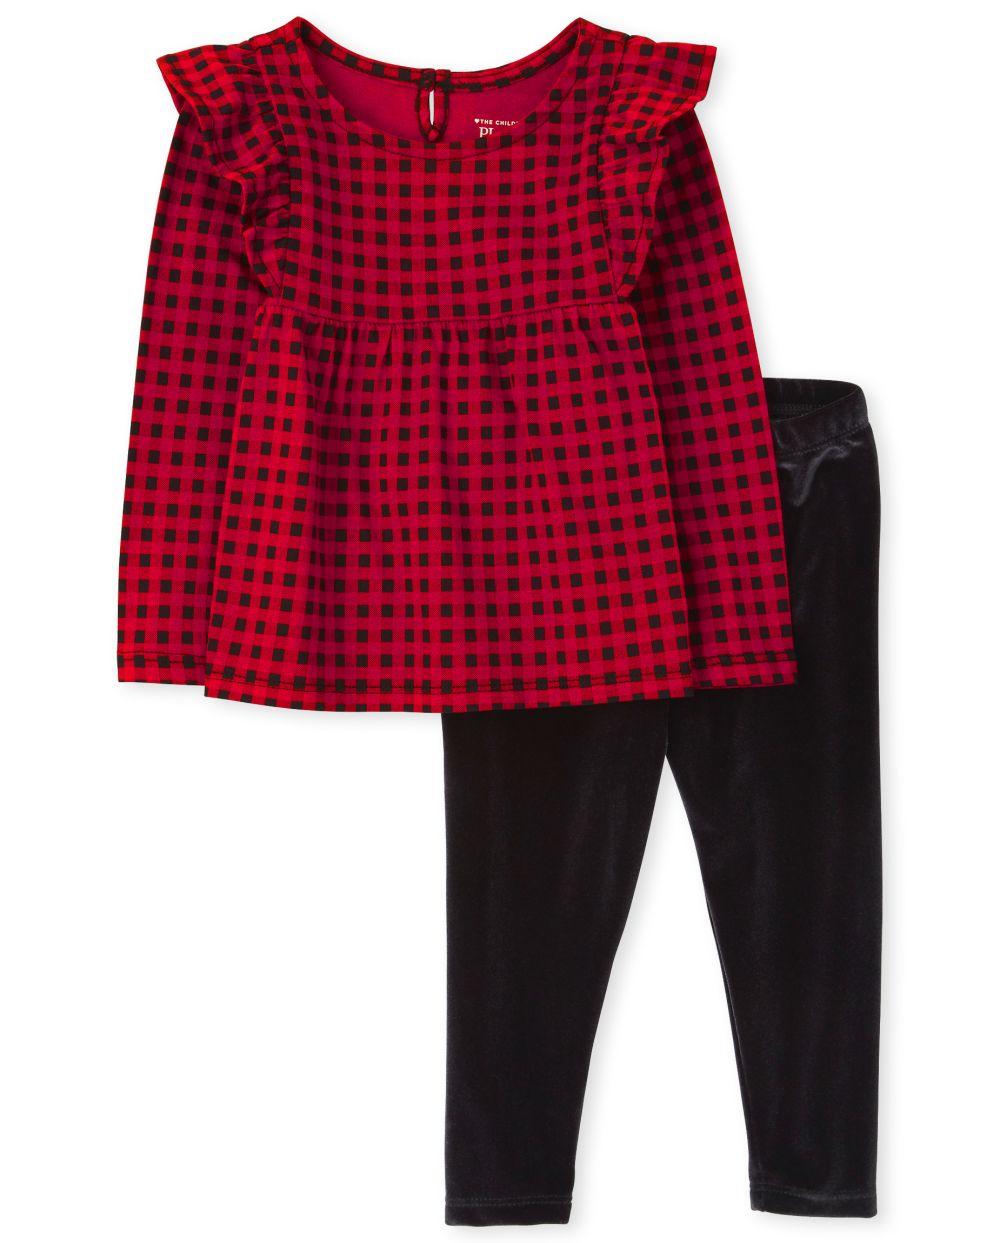 Toddler Girls Buffalo Plaid Outfit Set